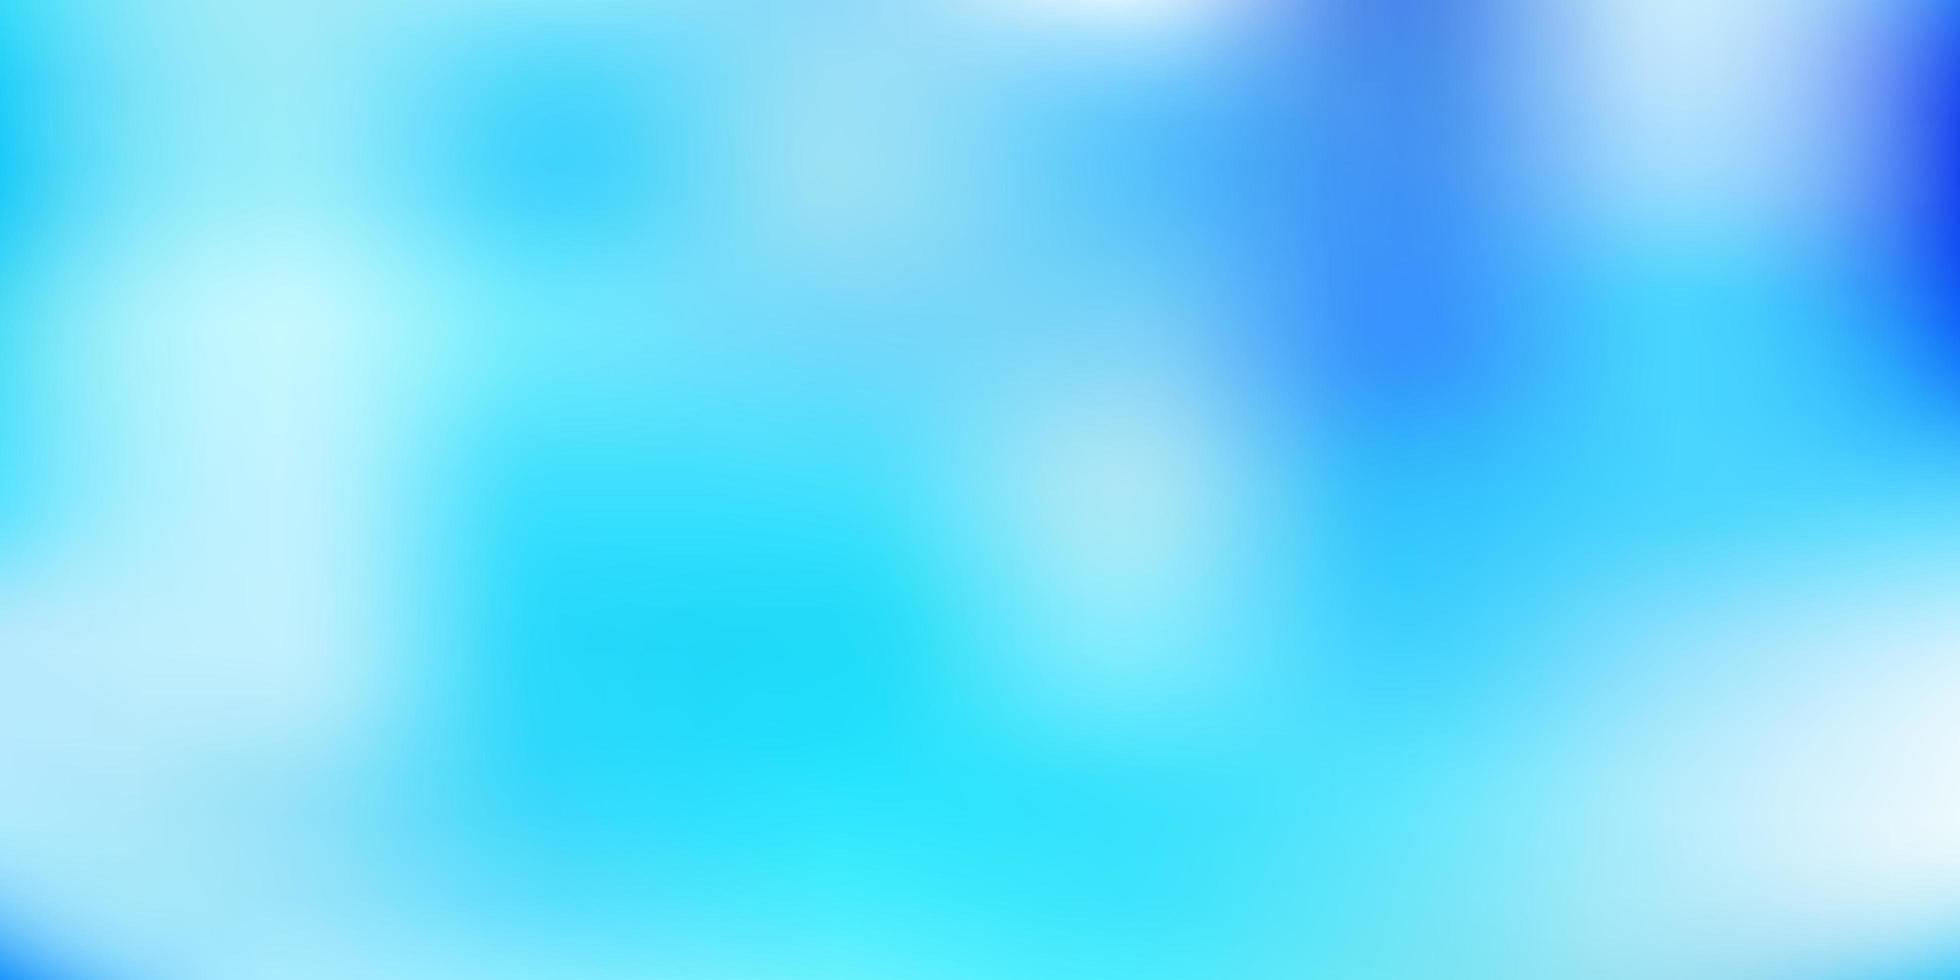 sfondo sfocato sfumato blu chiaro. vettore